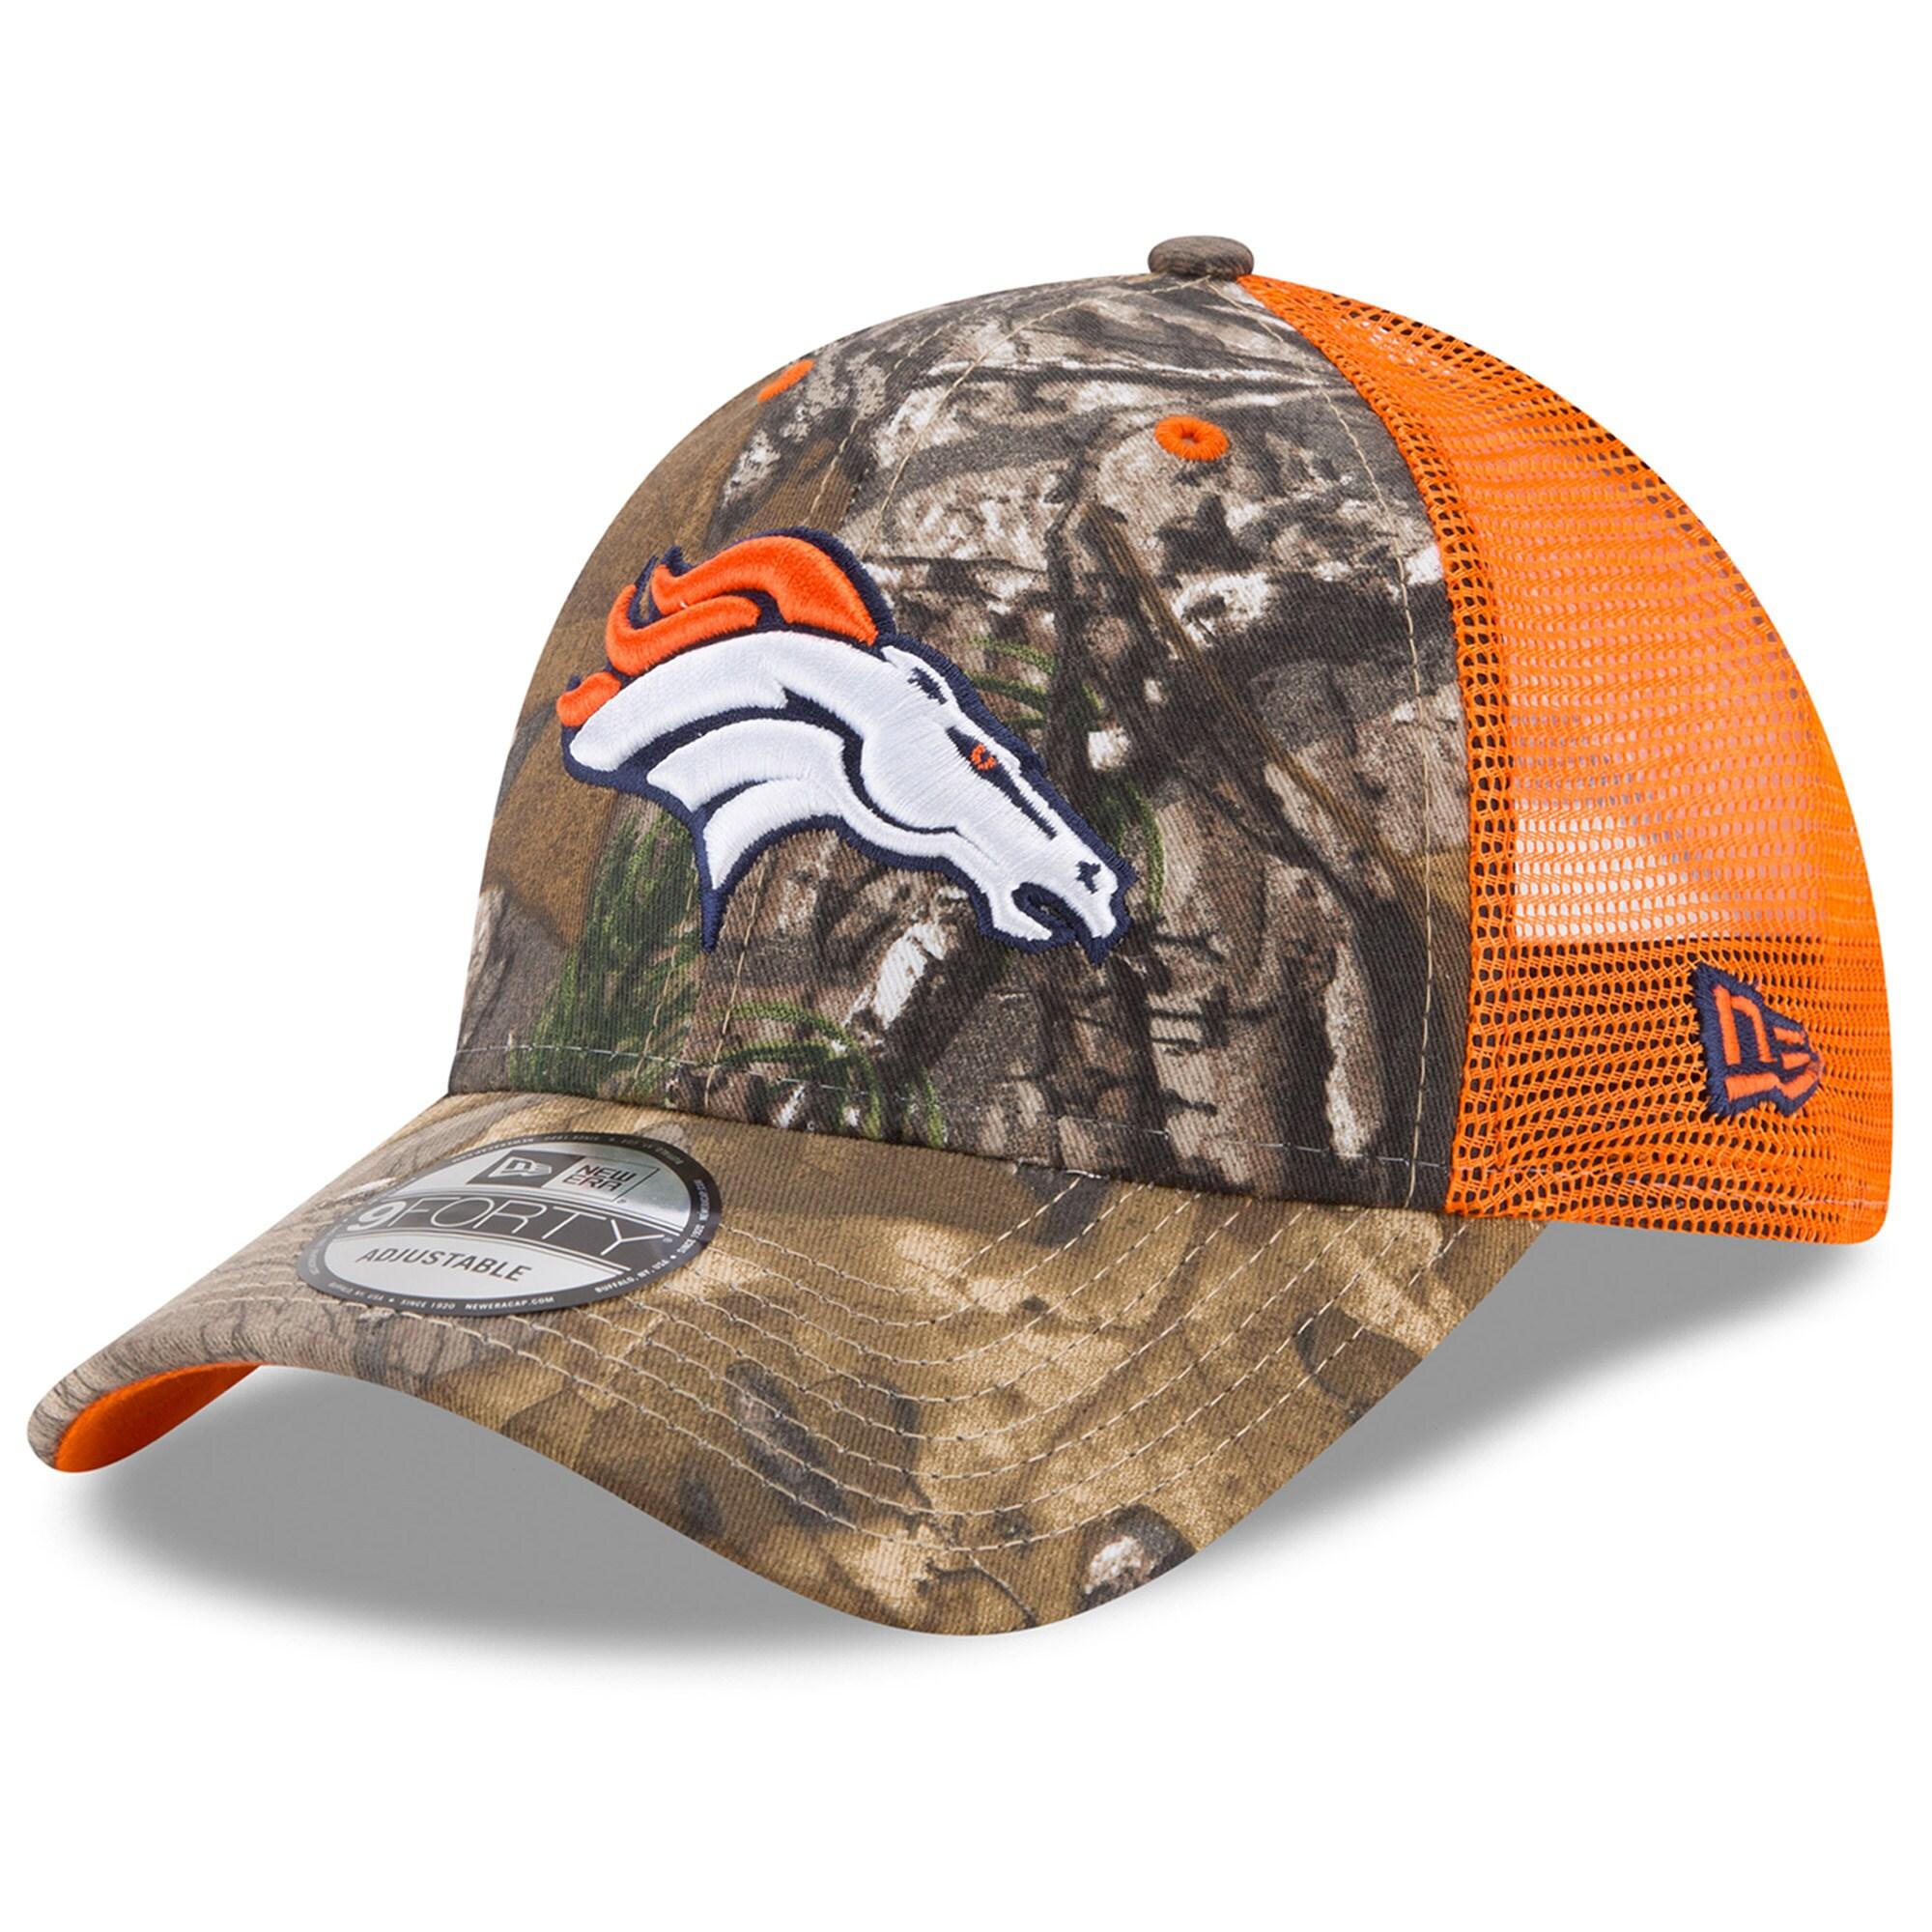 Denver Broncos New Era Trucker 9FORTY Adjustable Snapback Hat - Realtree Camo/Orange